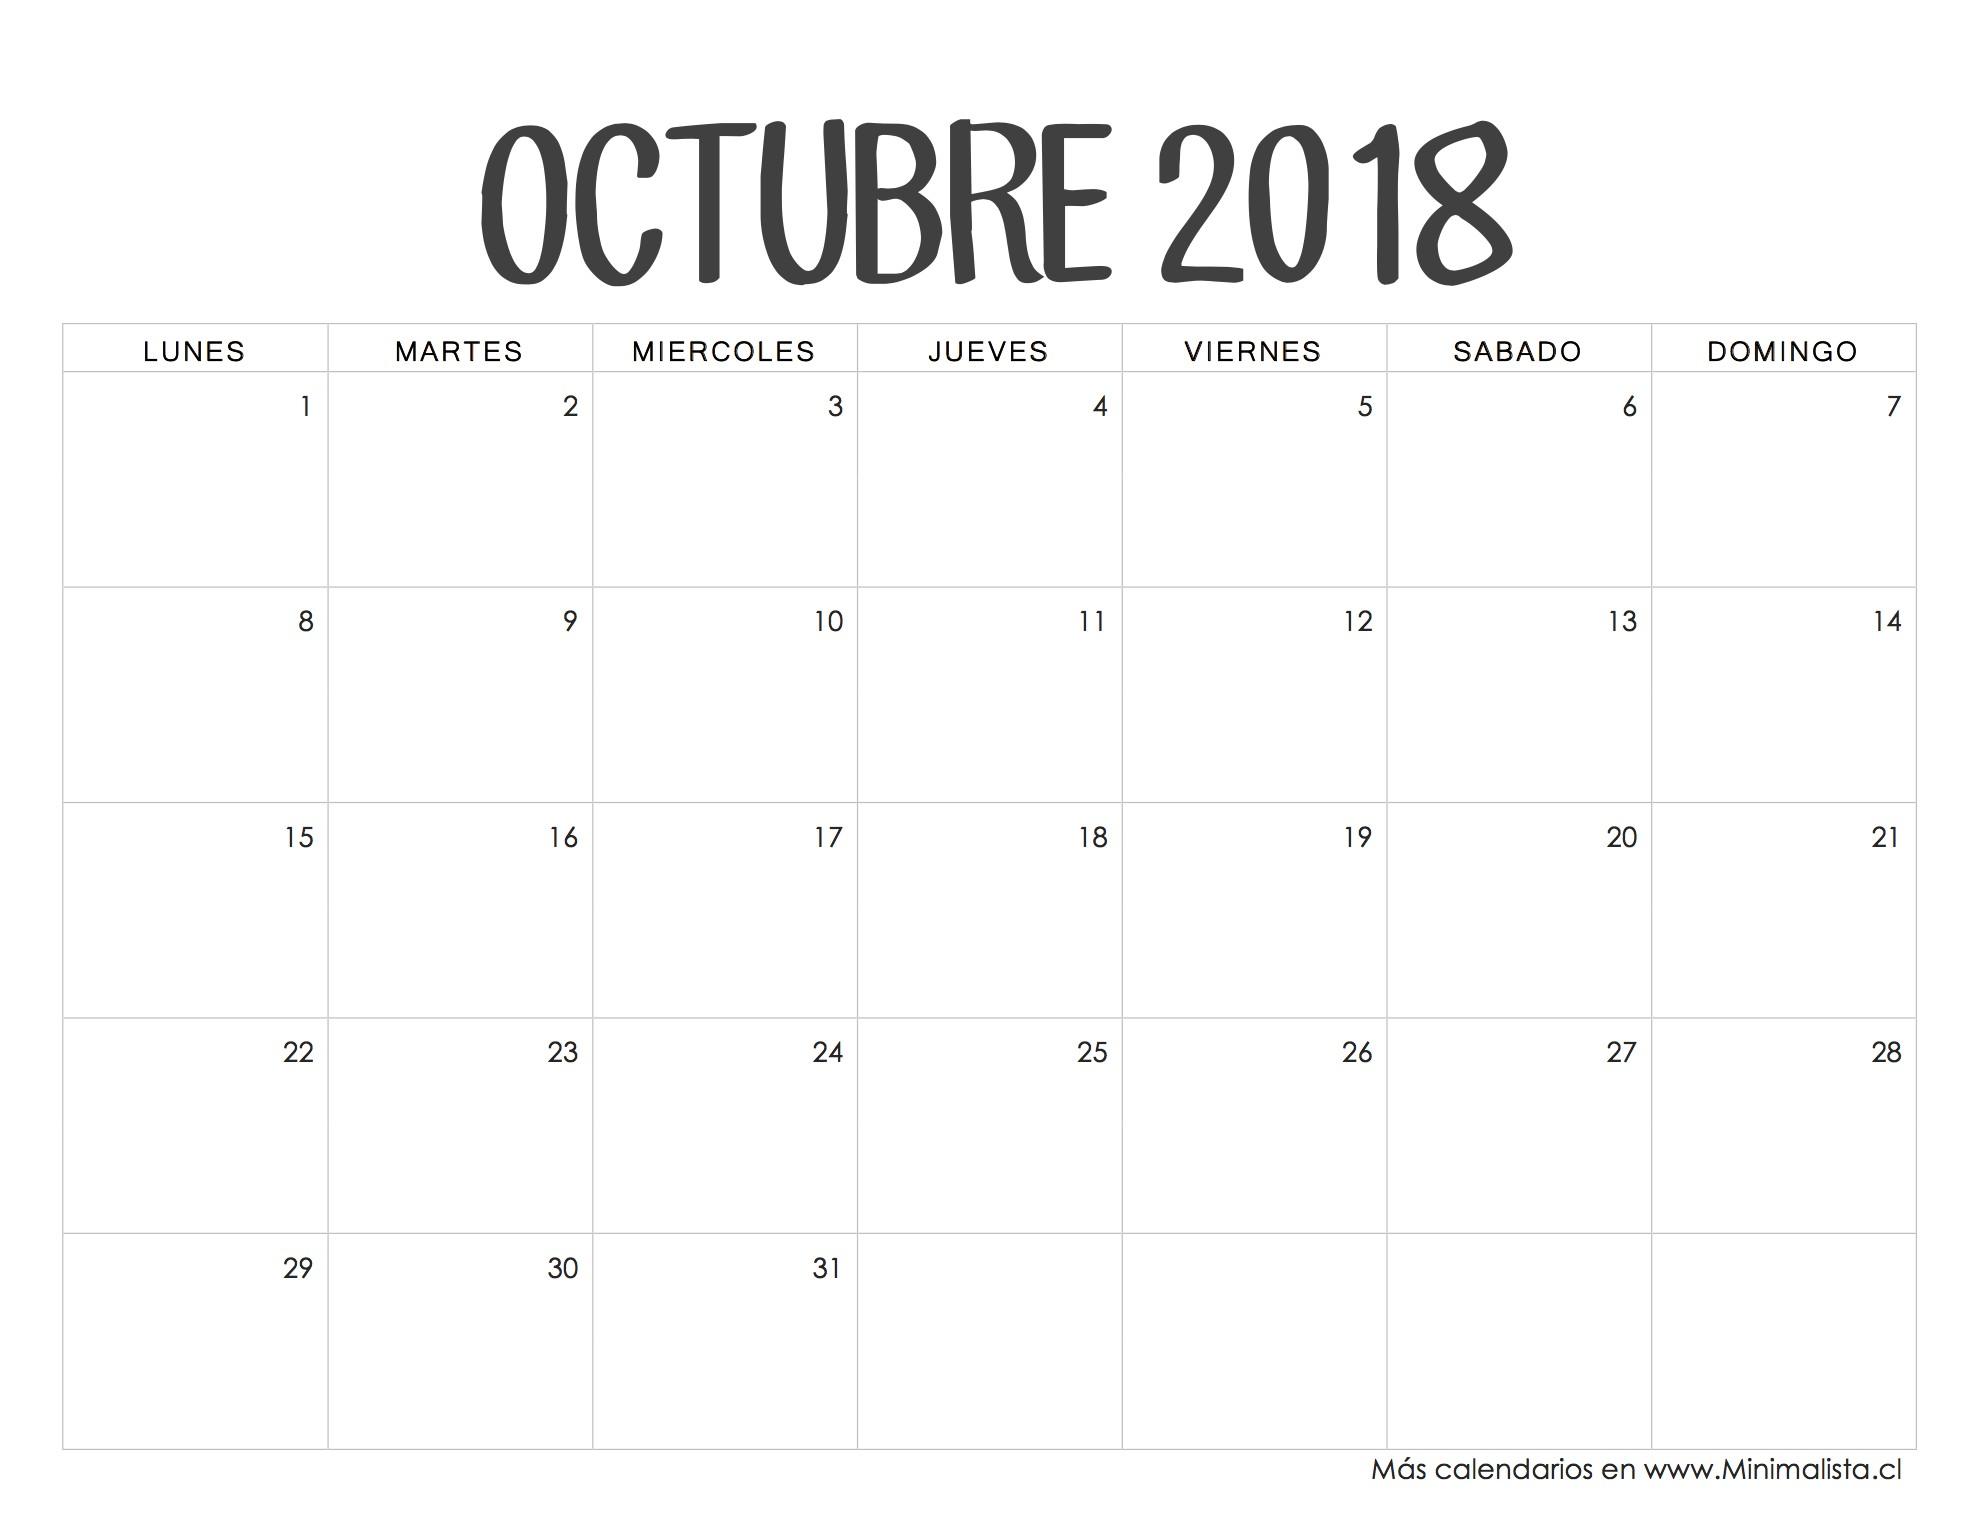 Calendario Imprimir 2017 Agosto Recientes Calendario Octubre 2018 organizarme Pinterest Of Calendario Imprimir 2017 Agosto Más Recientes Calendario Académico Ug 2018 – 2019 – Universidad De Guayaquil